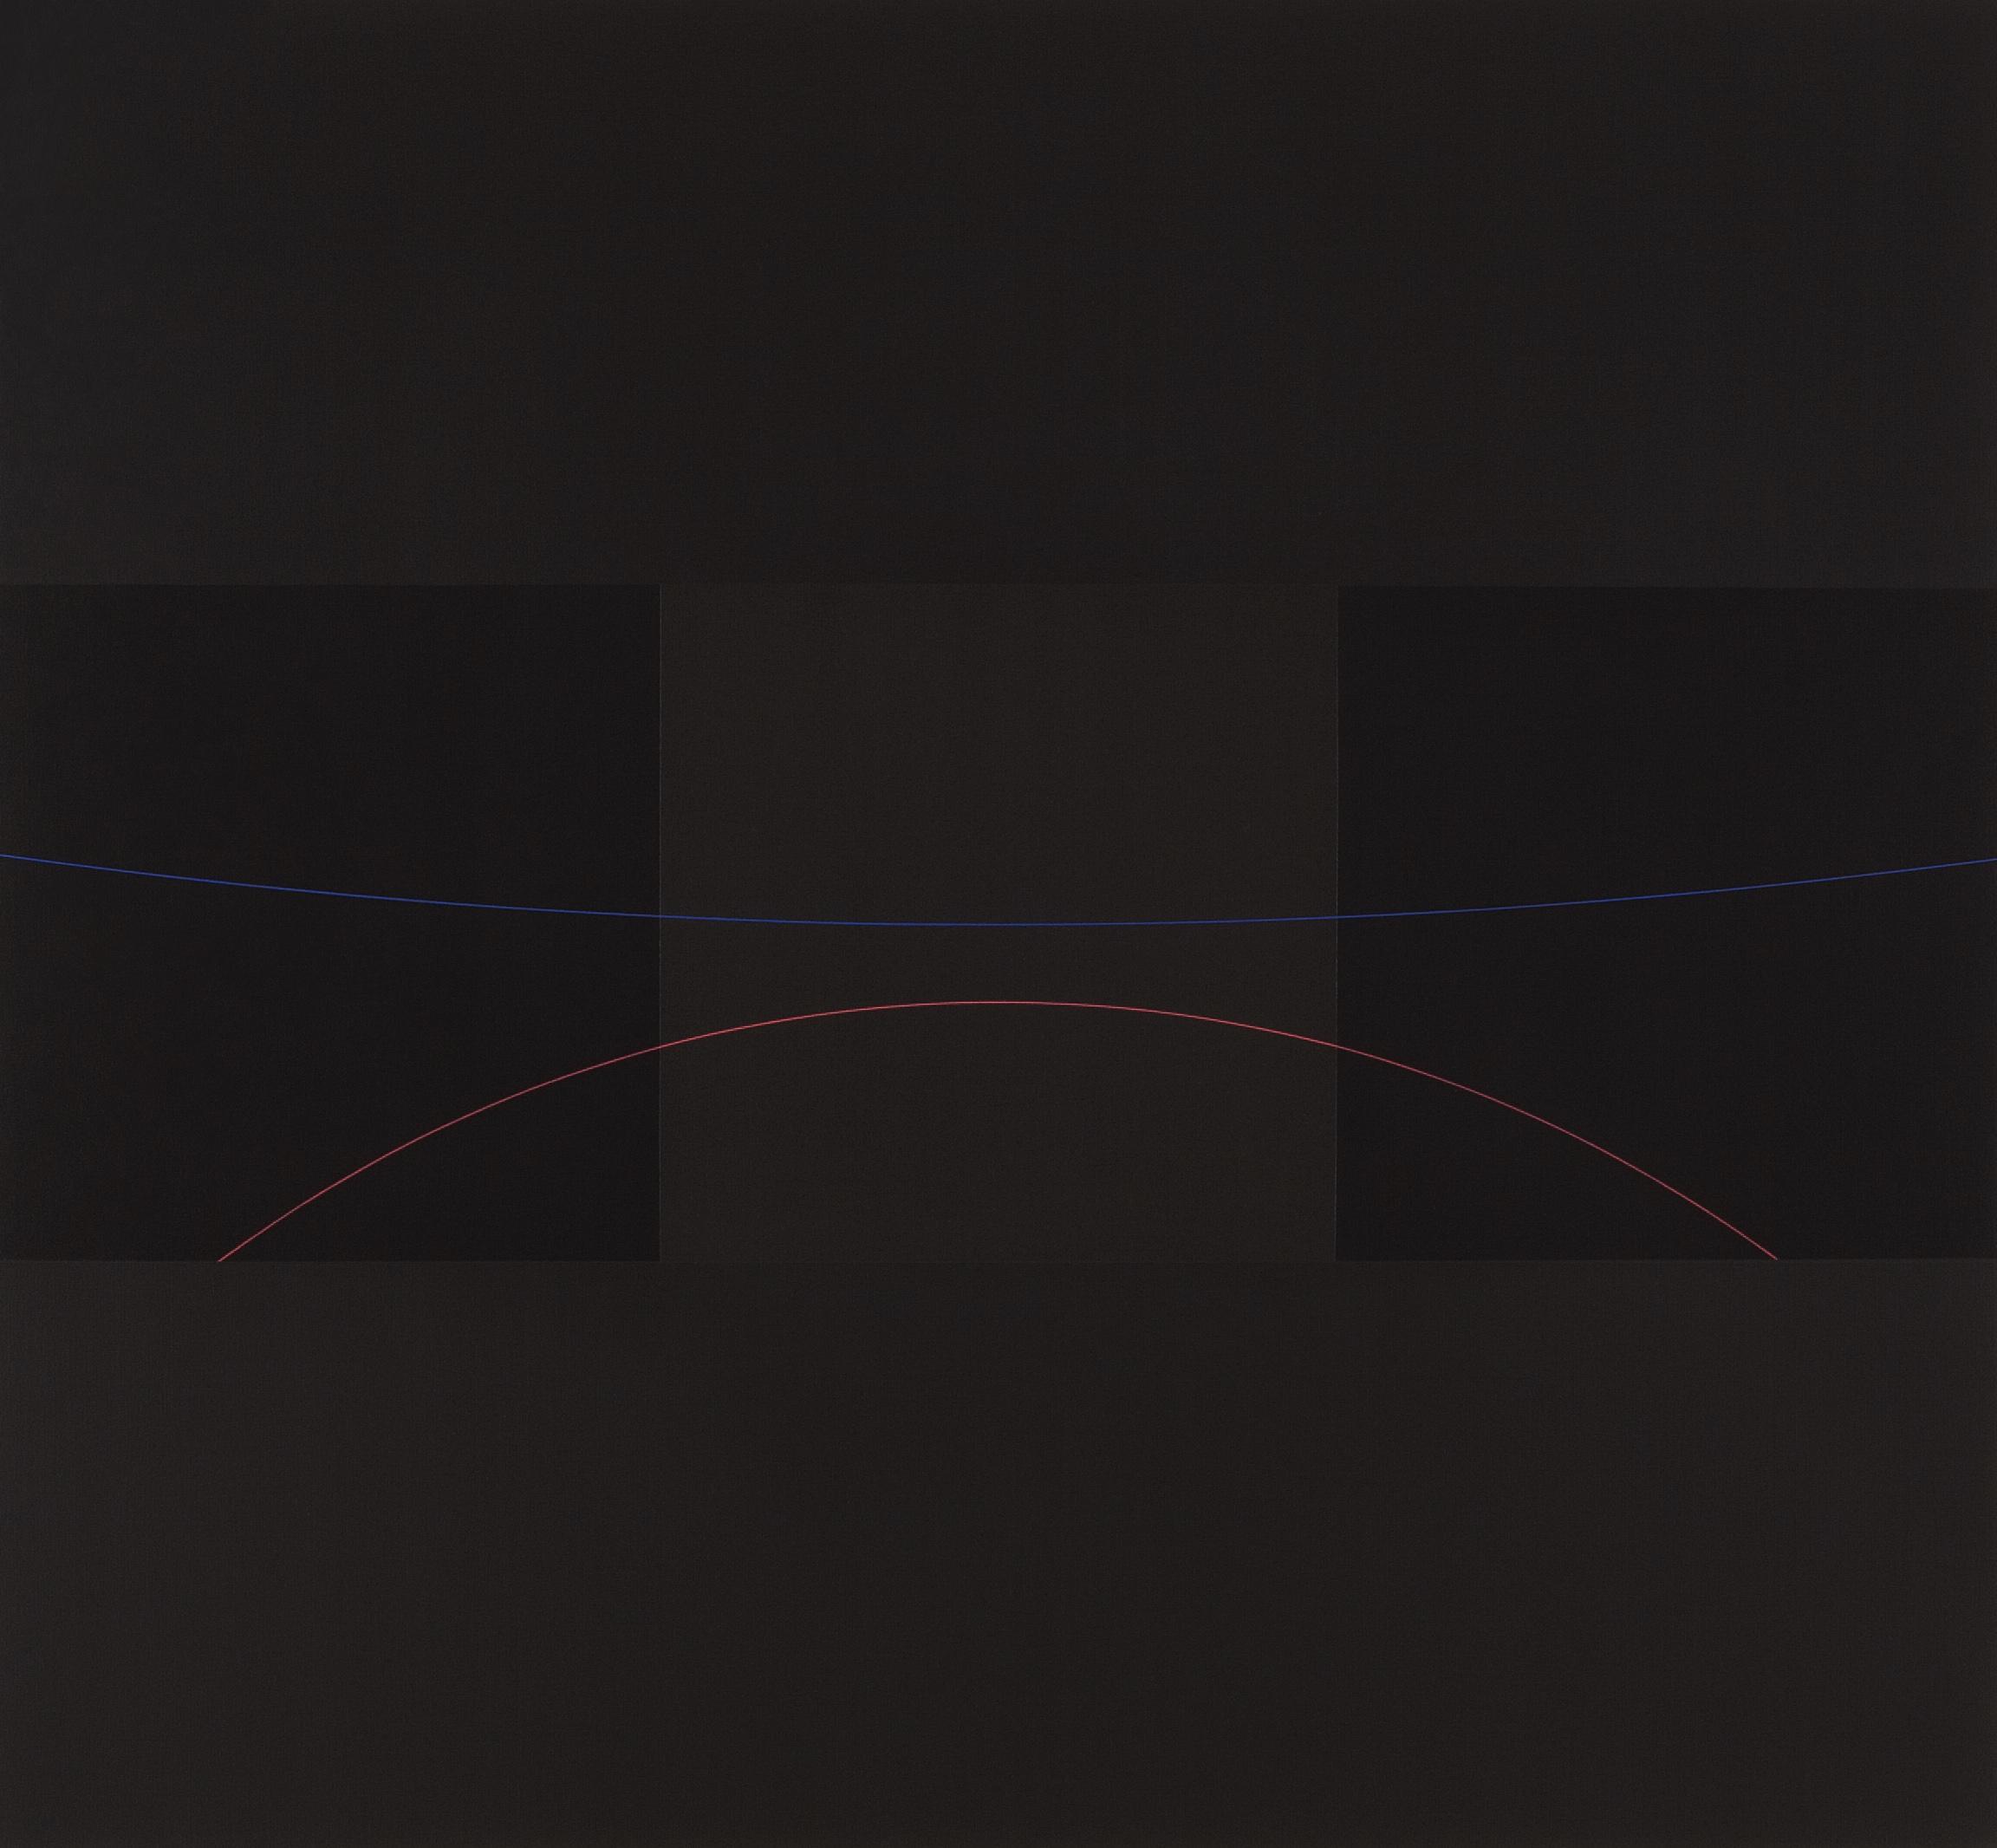 Painting(1)2007.Nov, acrylic on canvas, 47 1/4 x 51 3/16 in.[120x130cm]